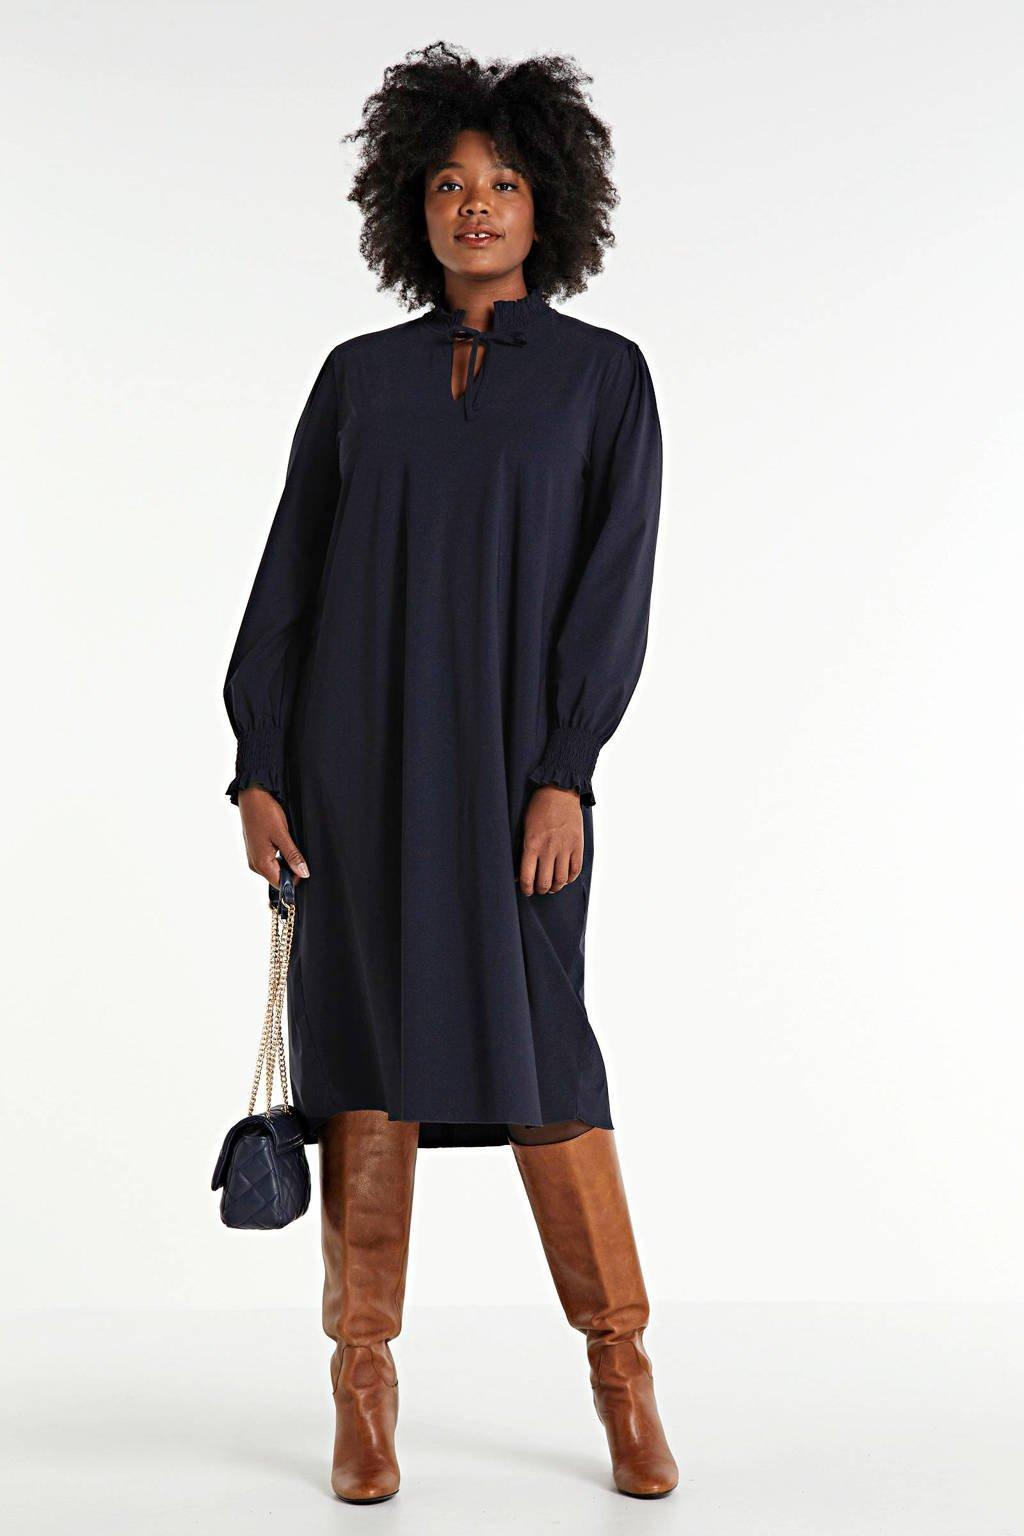 Plus Basics jurk in travel kwaliteit met ruches donkerblauw, Donkerblauw